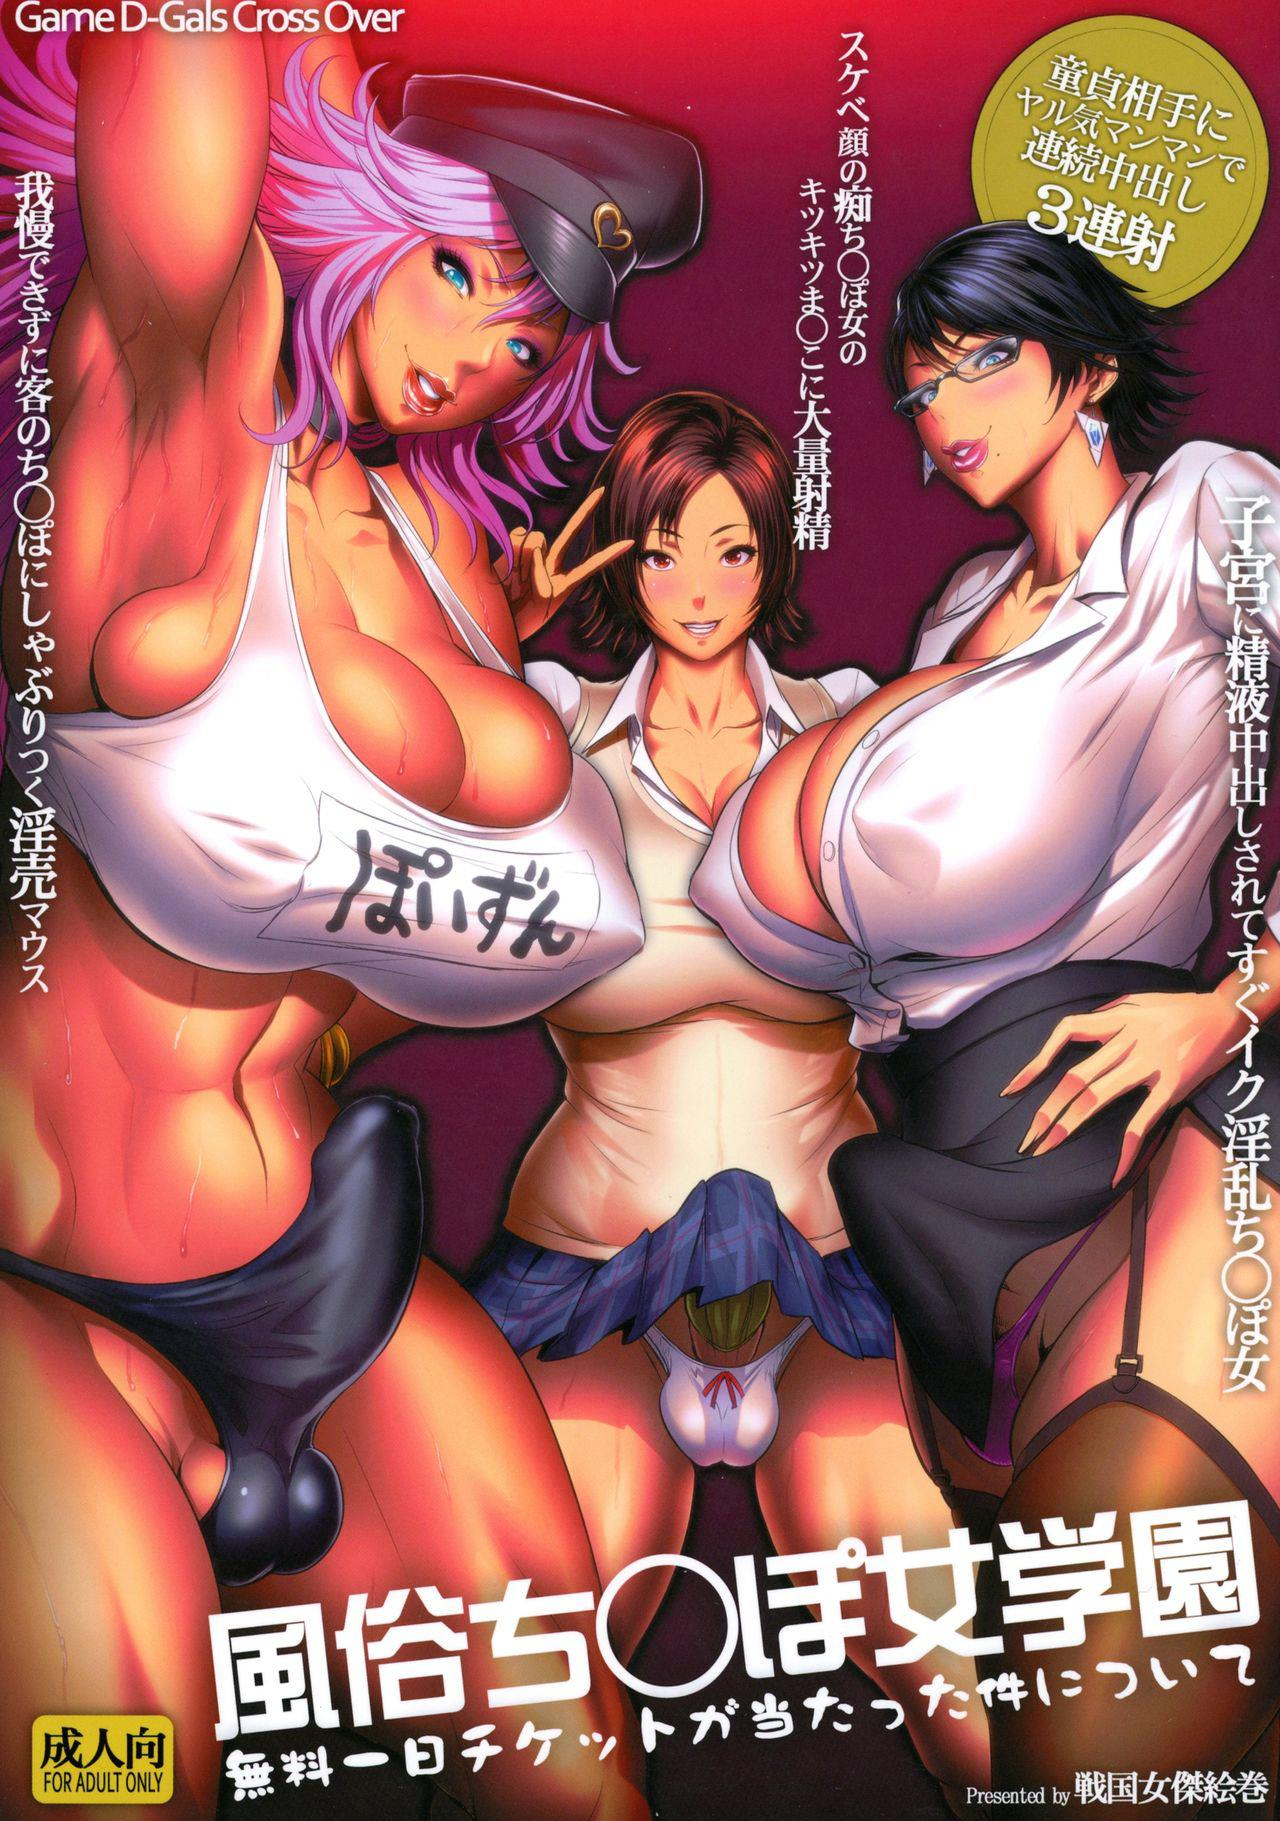 Sexy Penis Women Academy (Street Fighter)